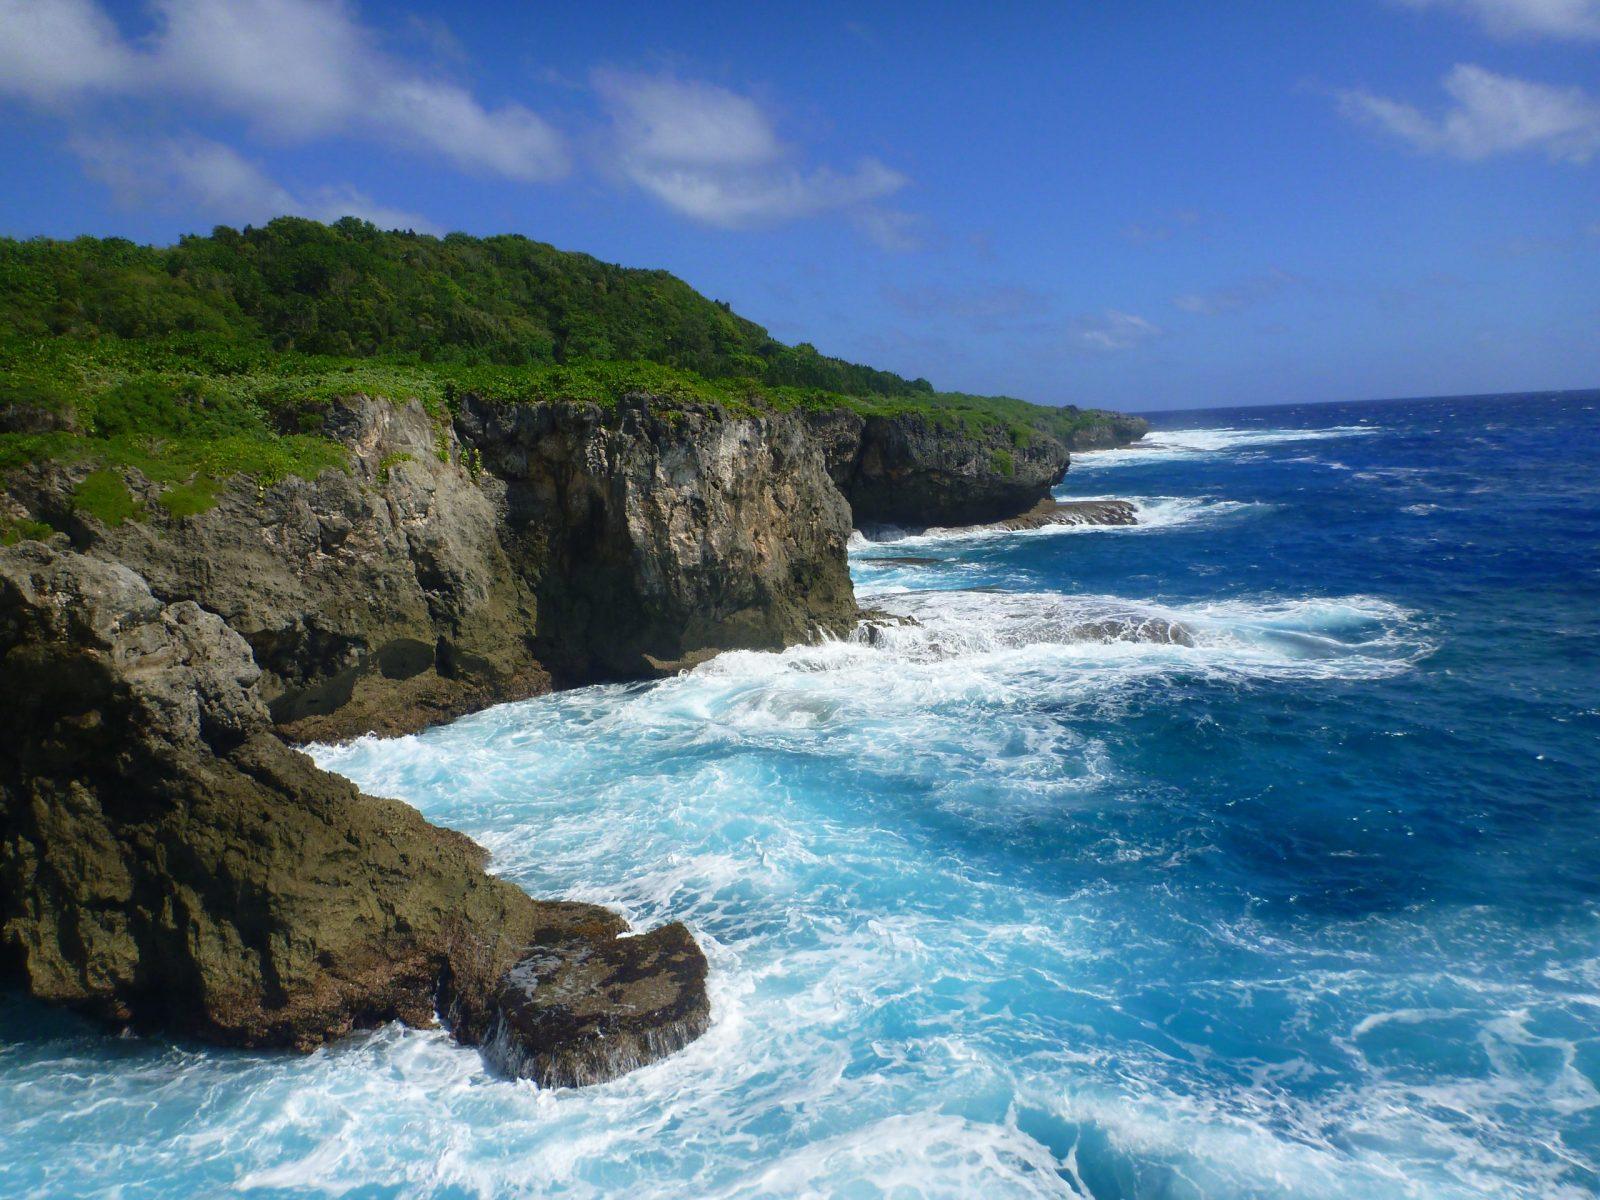 Guam coast line with waves